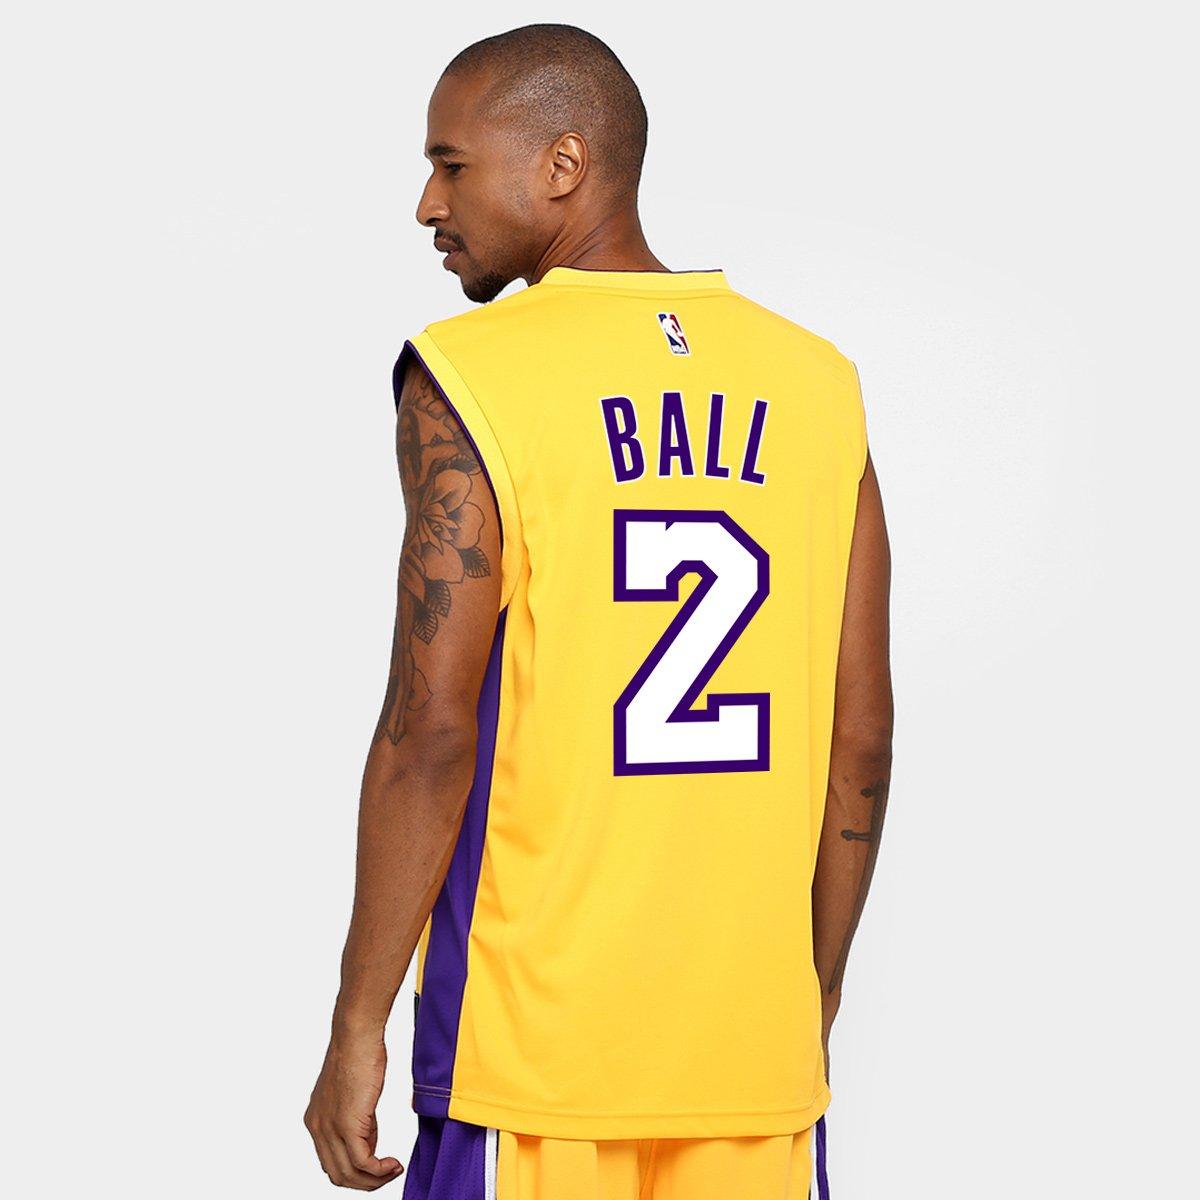 adb59672a4f01 Camiseta Regata NBA Adidas Los Angeles Lakers Home - Ball - Compre Agora